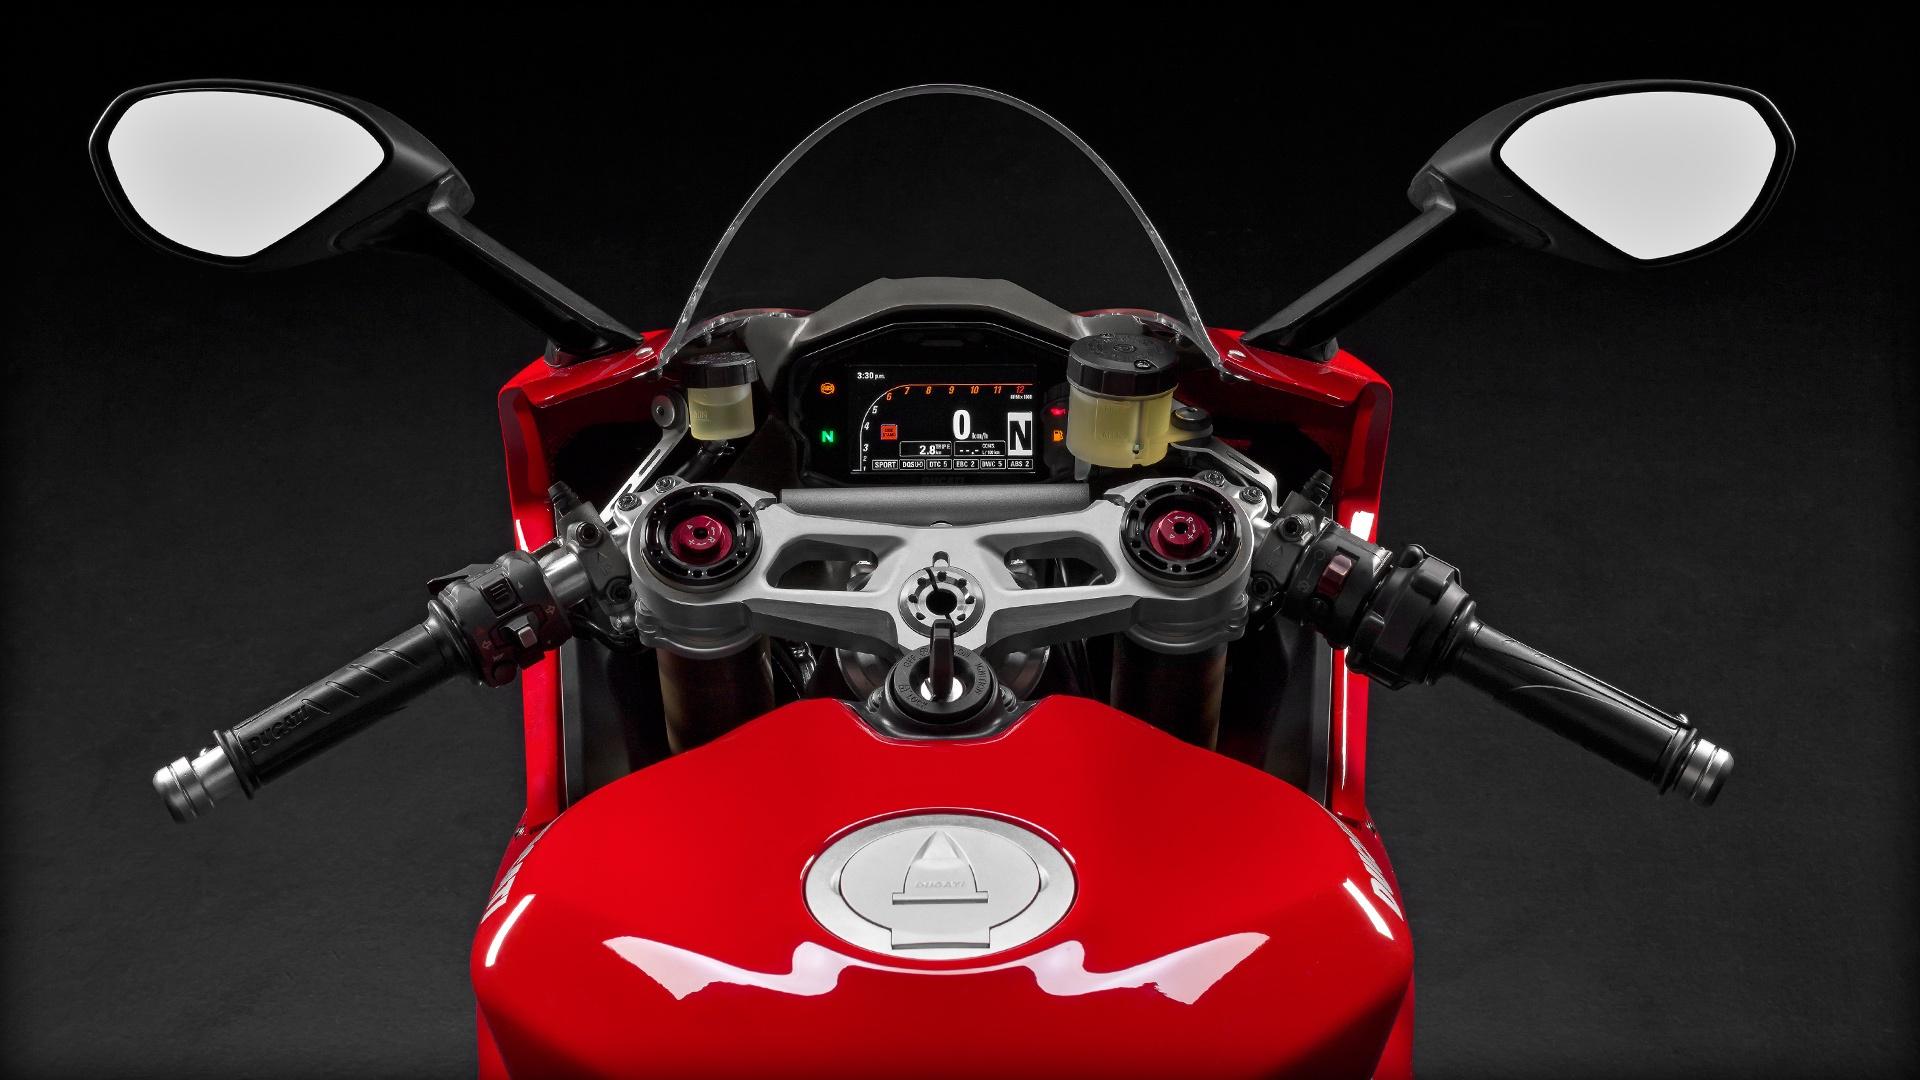 МОТОЦИКЛ DUCATI SUPERBIKE 1299 PANIGALE ― Артмото - купить квадроцикл в украине и харькове, мотоцикл, снегоход, скутер, мопед, электромобиль